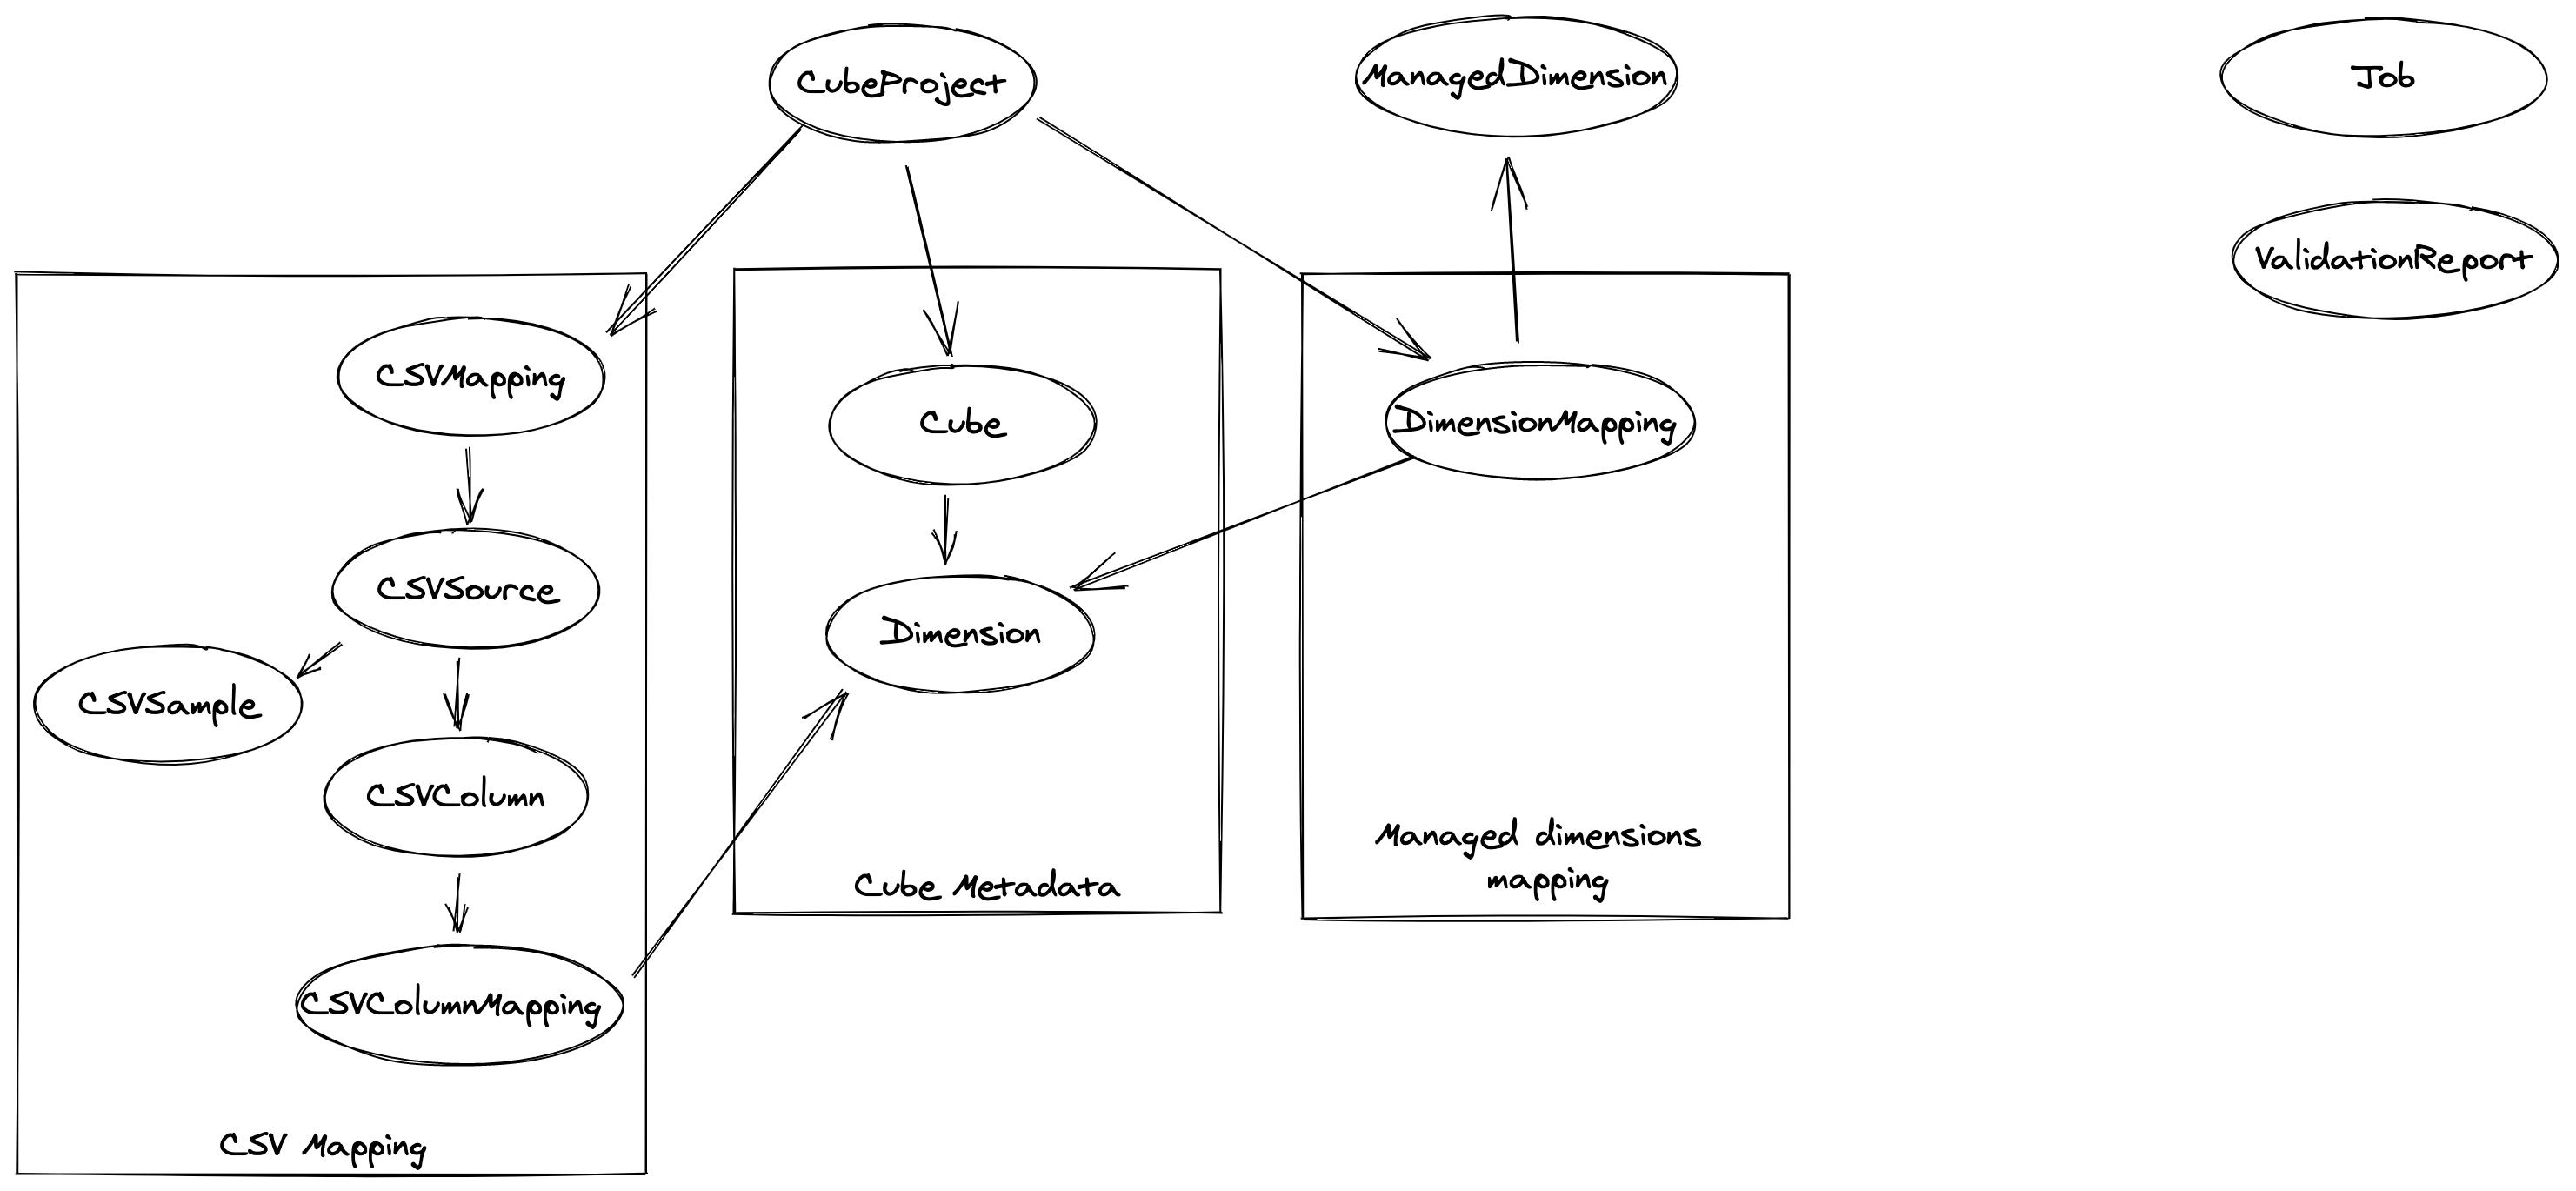 cc_raw-data-model